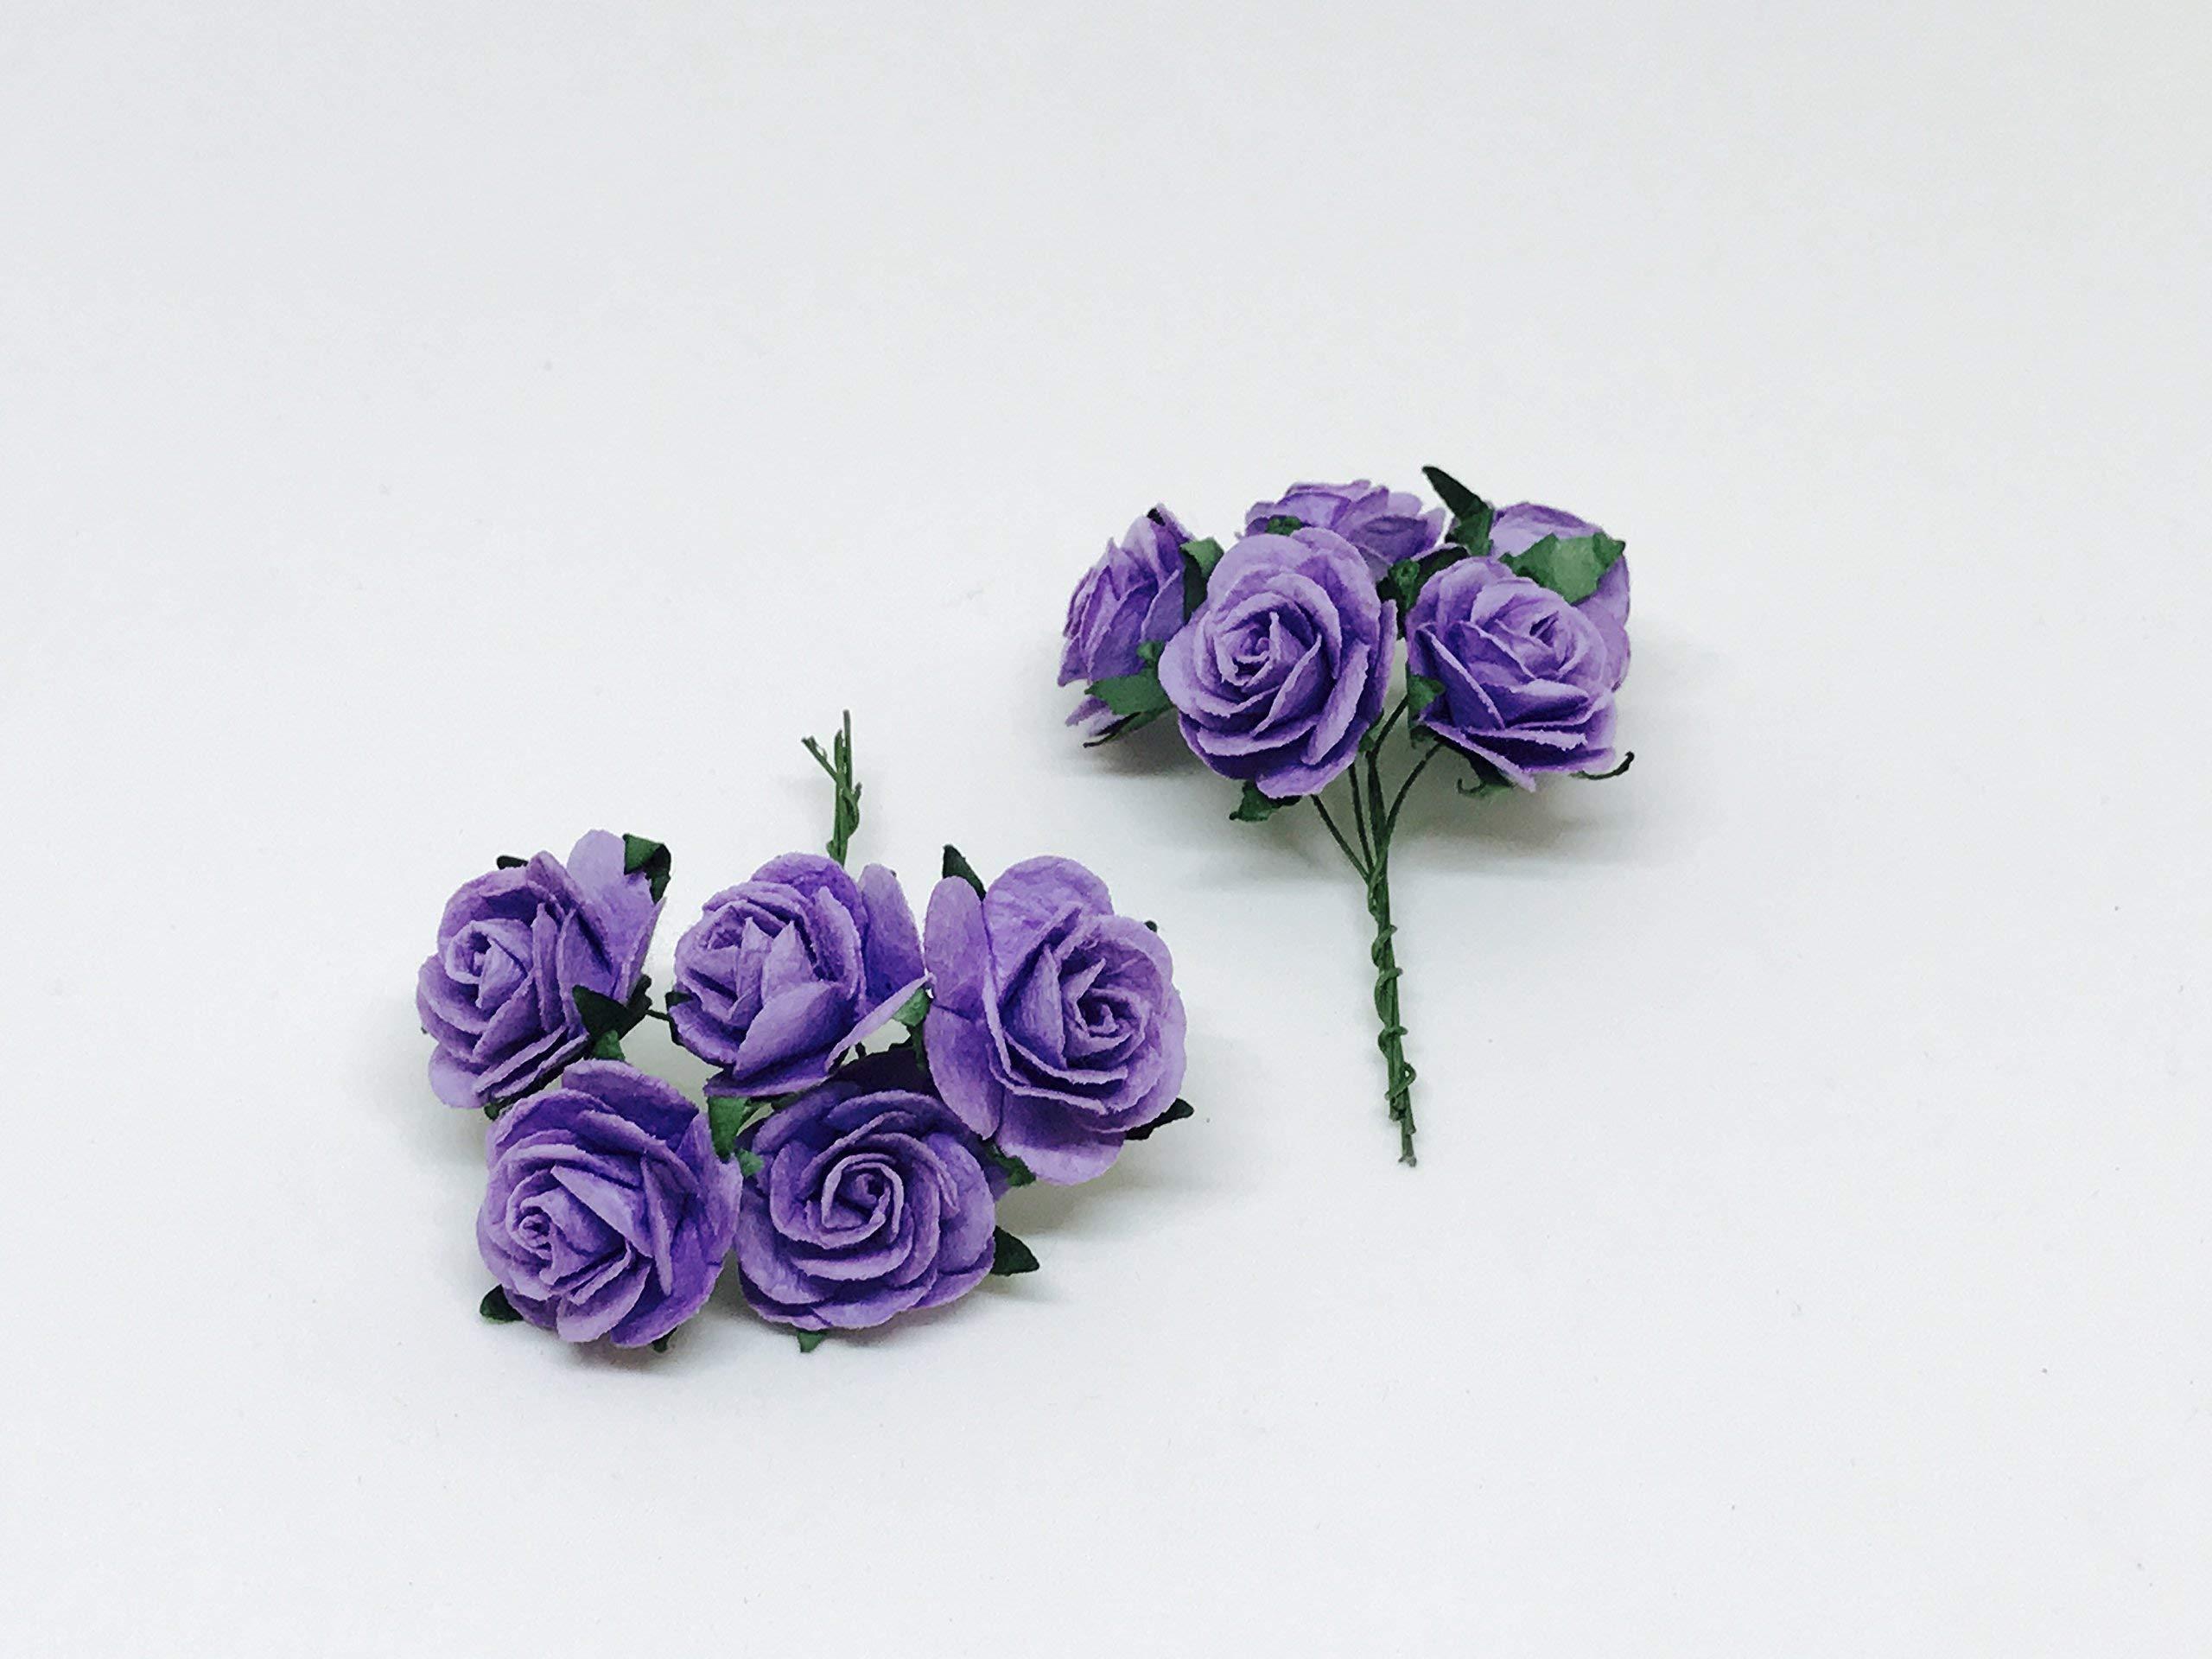 1-Purple-Paper-Flowers-Paper-Rose-Artificial-Flowers-Fake-Flowers-Artificial-Roses-Paper-Craft-Flowers-Paper-Rose-Flower-Mulberry-Paper-Flowers-20-Pieces